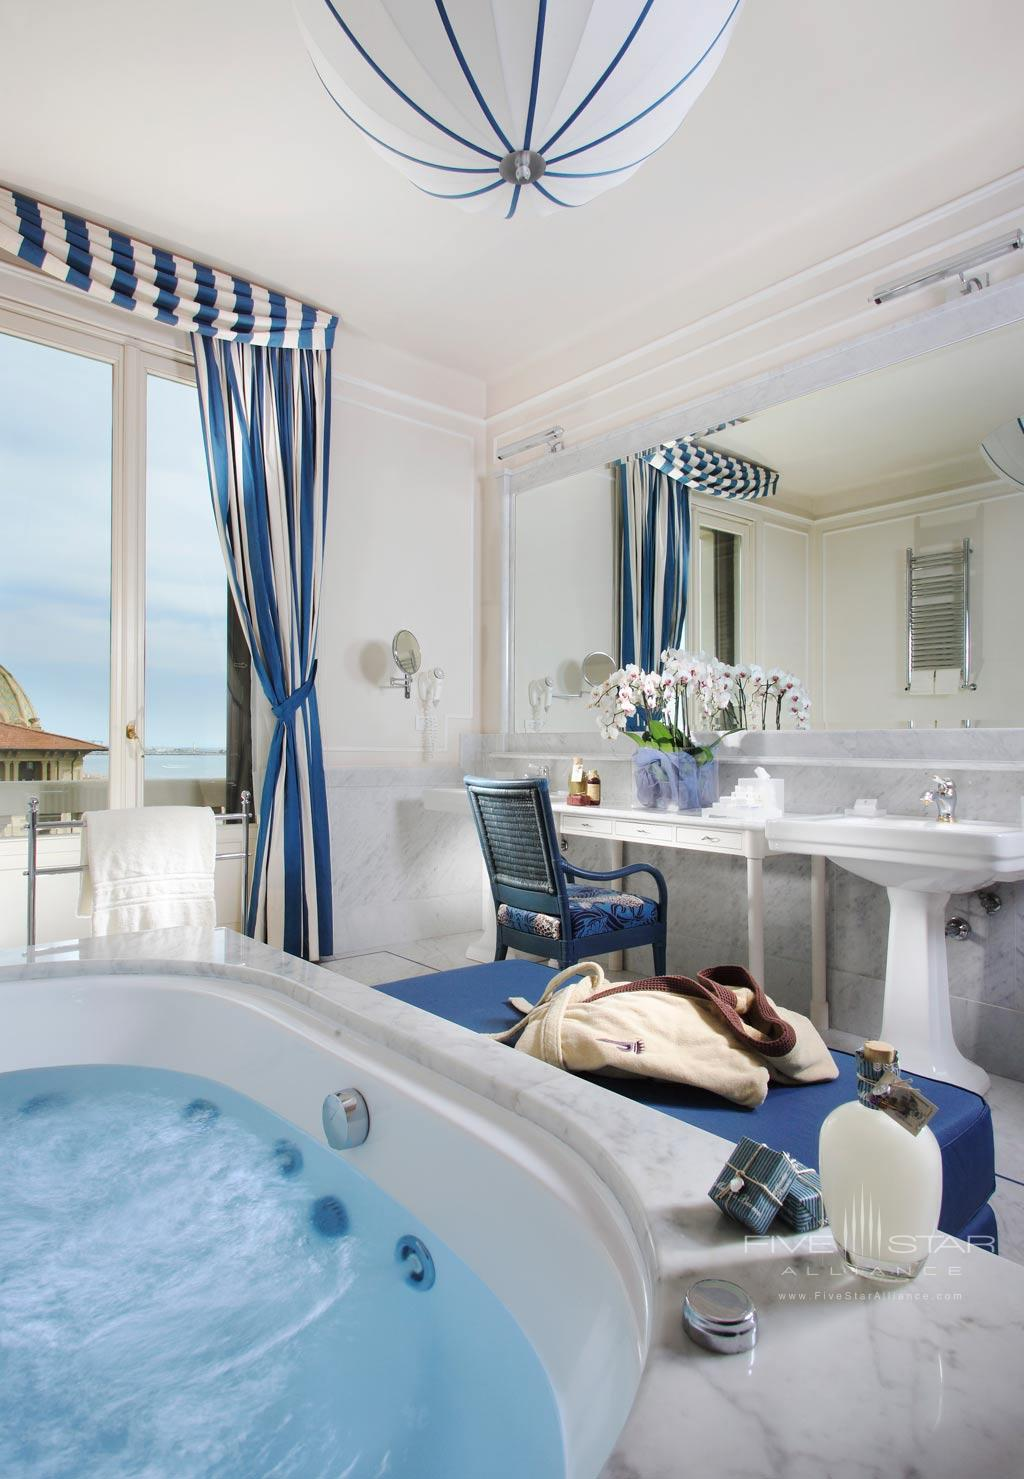 Sea View and Jacuzzi Junior Suite at Grand Hotel Principe di Piemonte, Viareggio LU, Italy